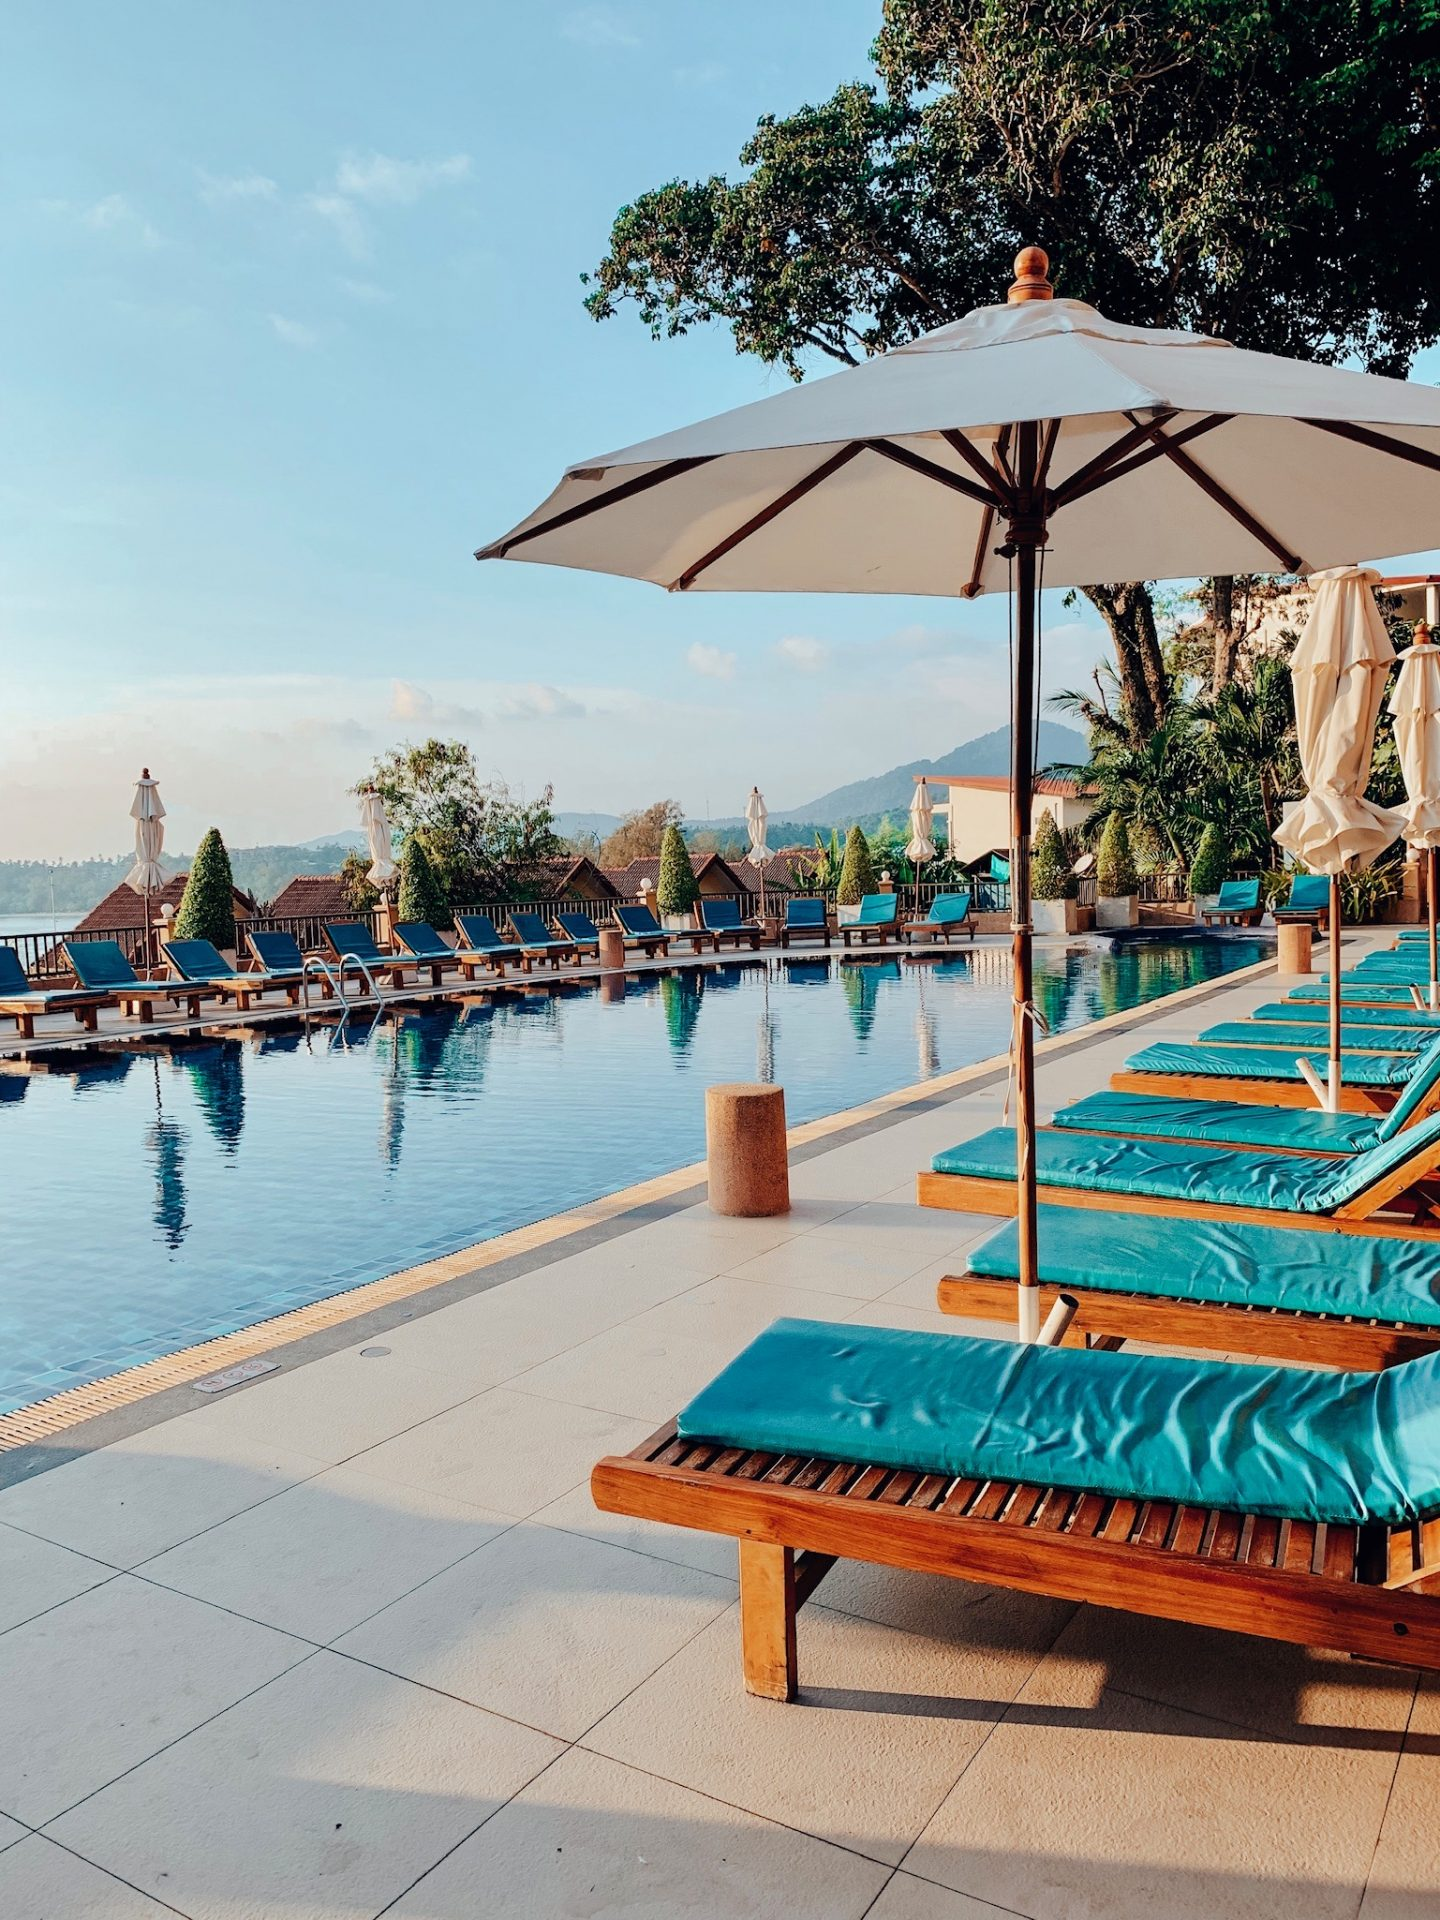 Our resort on Kata Beach in Phuket, Thailand!